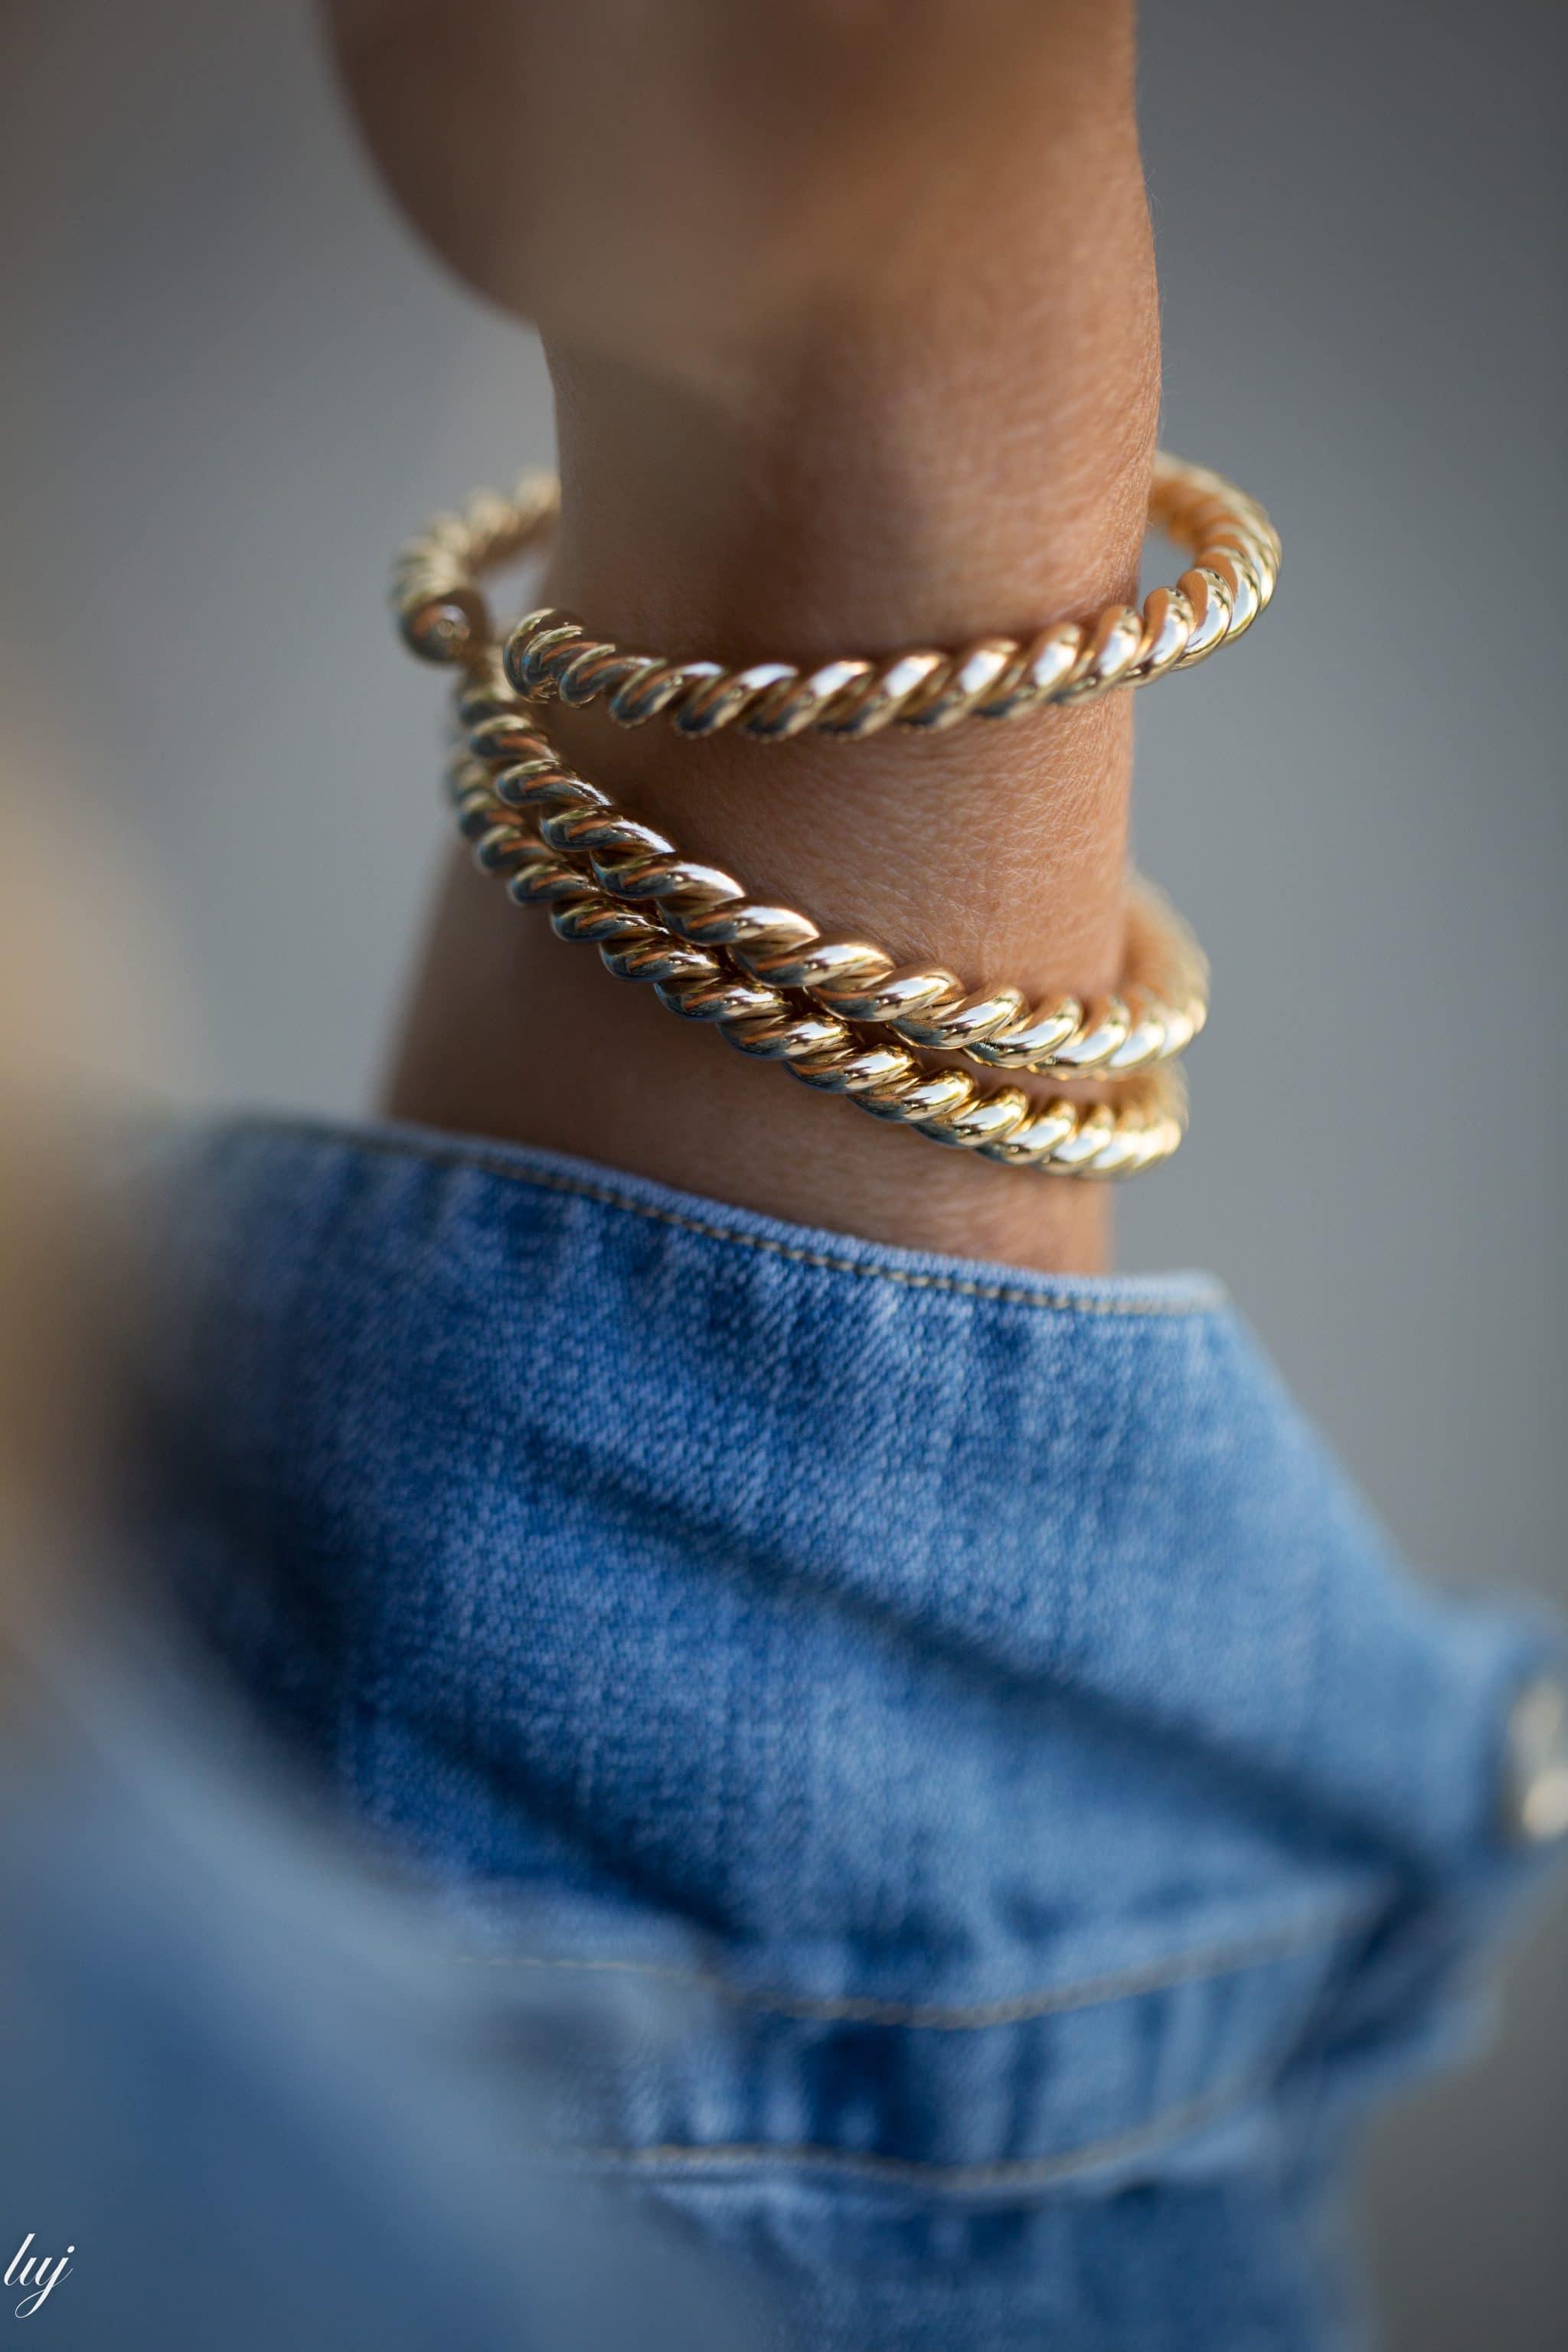 judith-2-braids-cuff-bangle-2